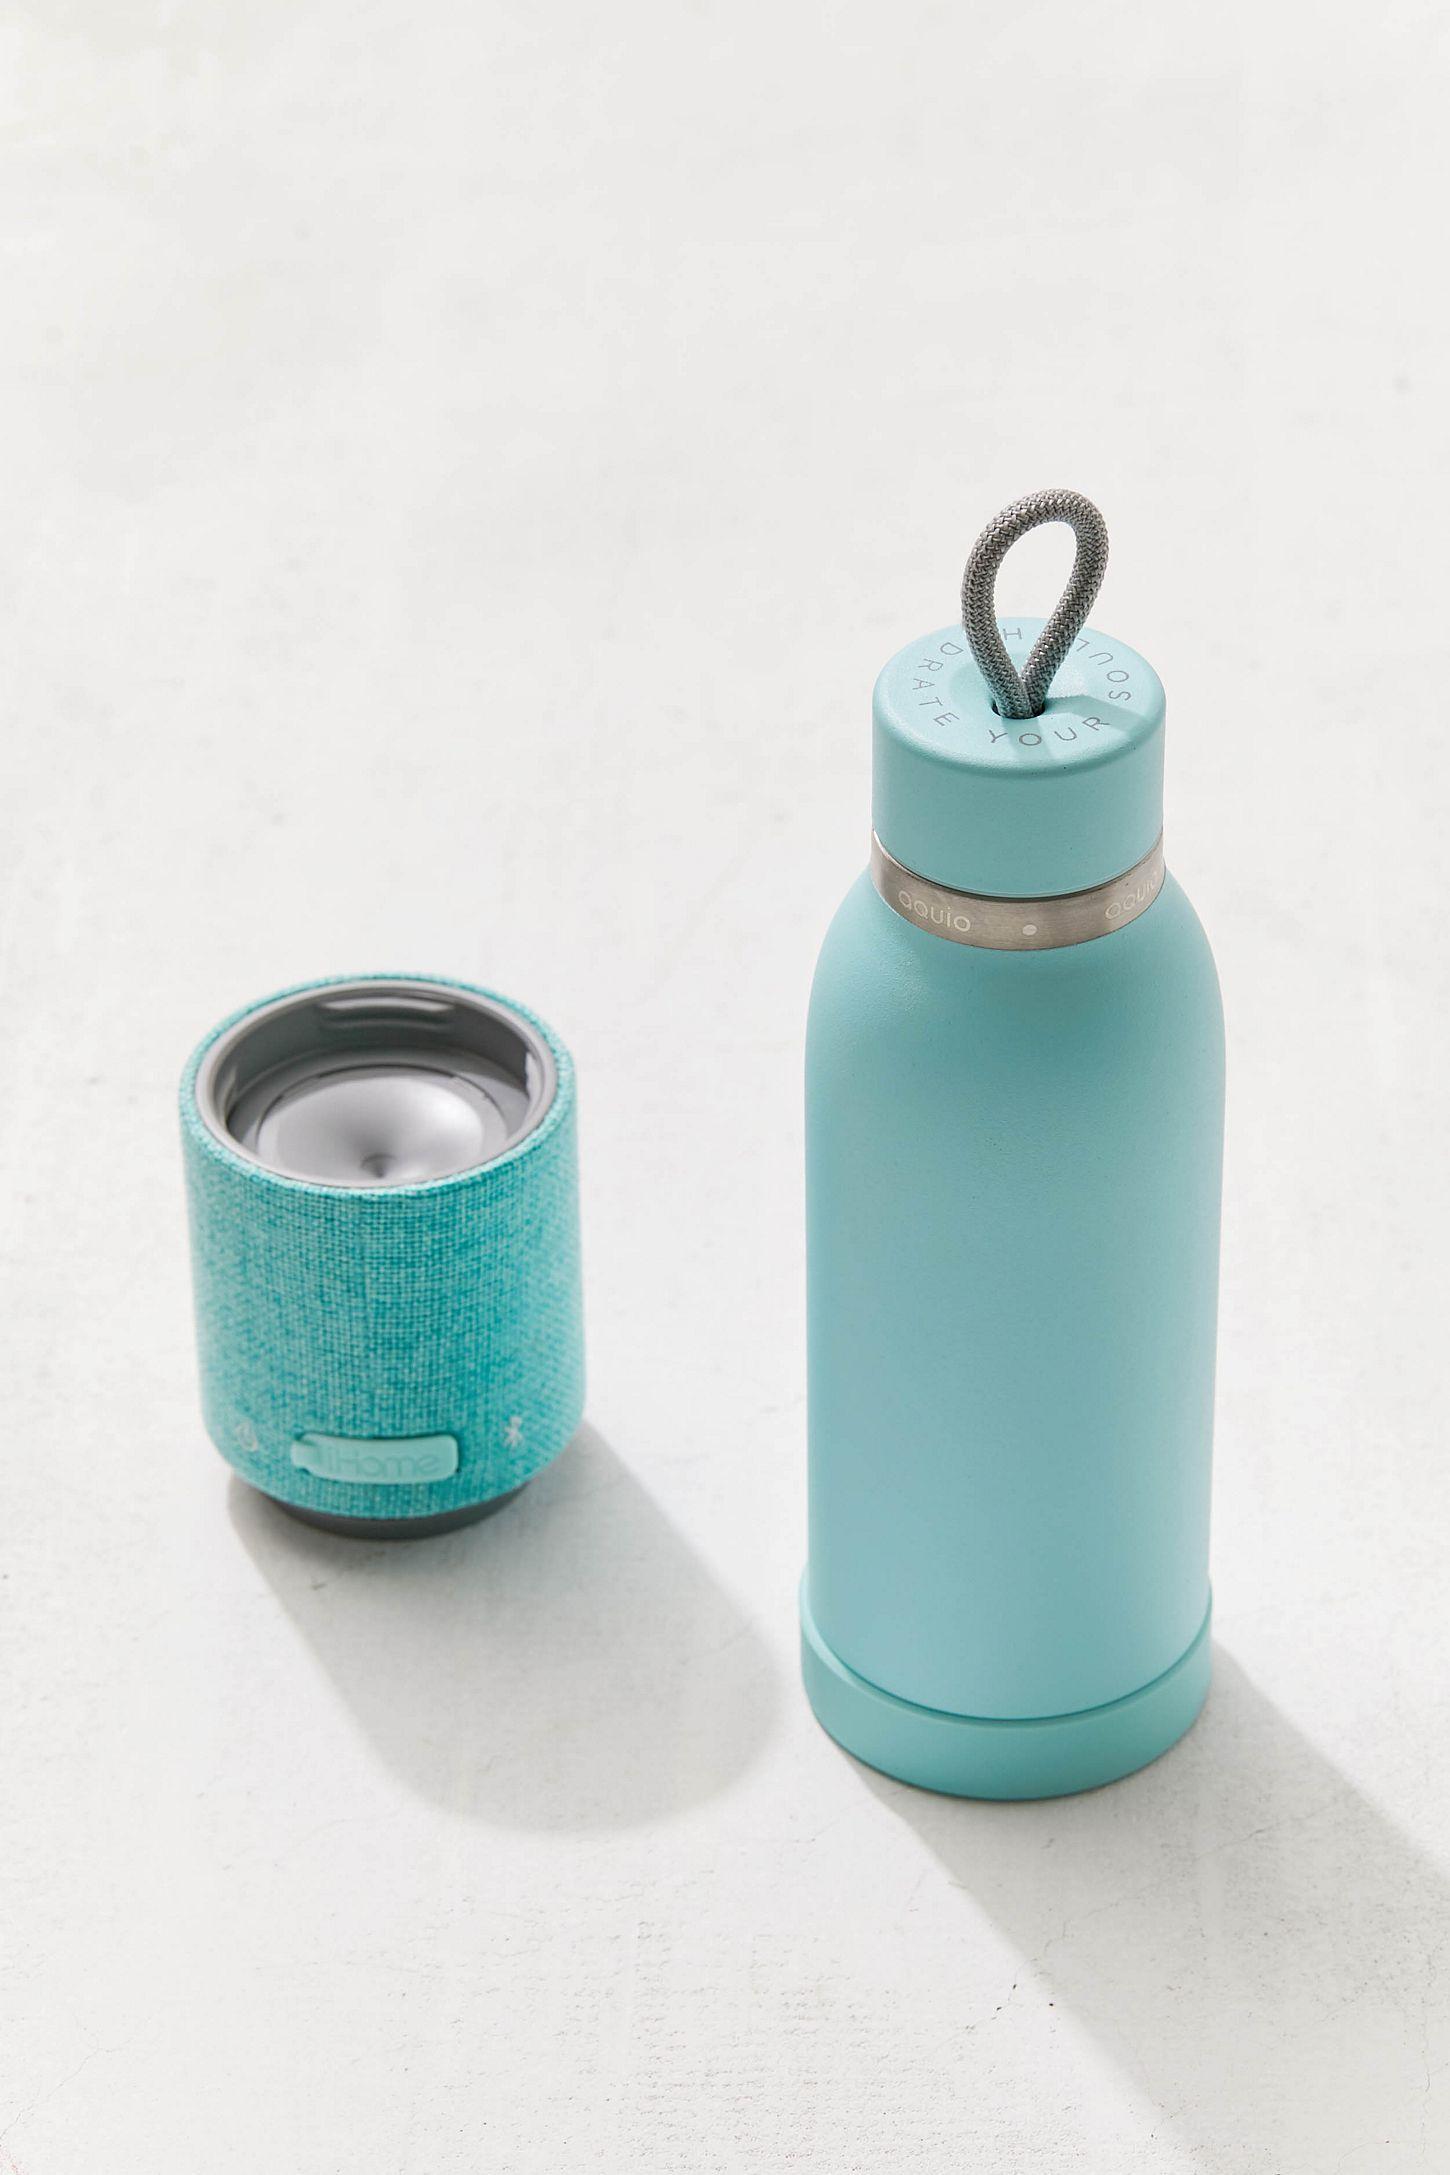 556d8f9009 Aquio Bluetooth Water Bottle Speaker   Turquoise   Water bottle ...